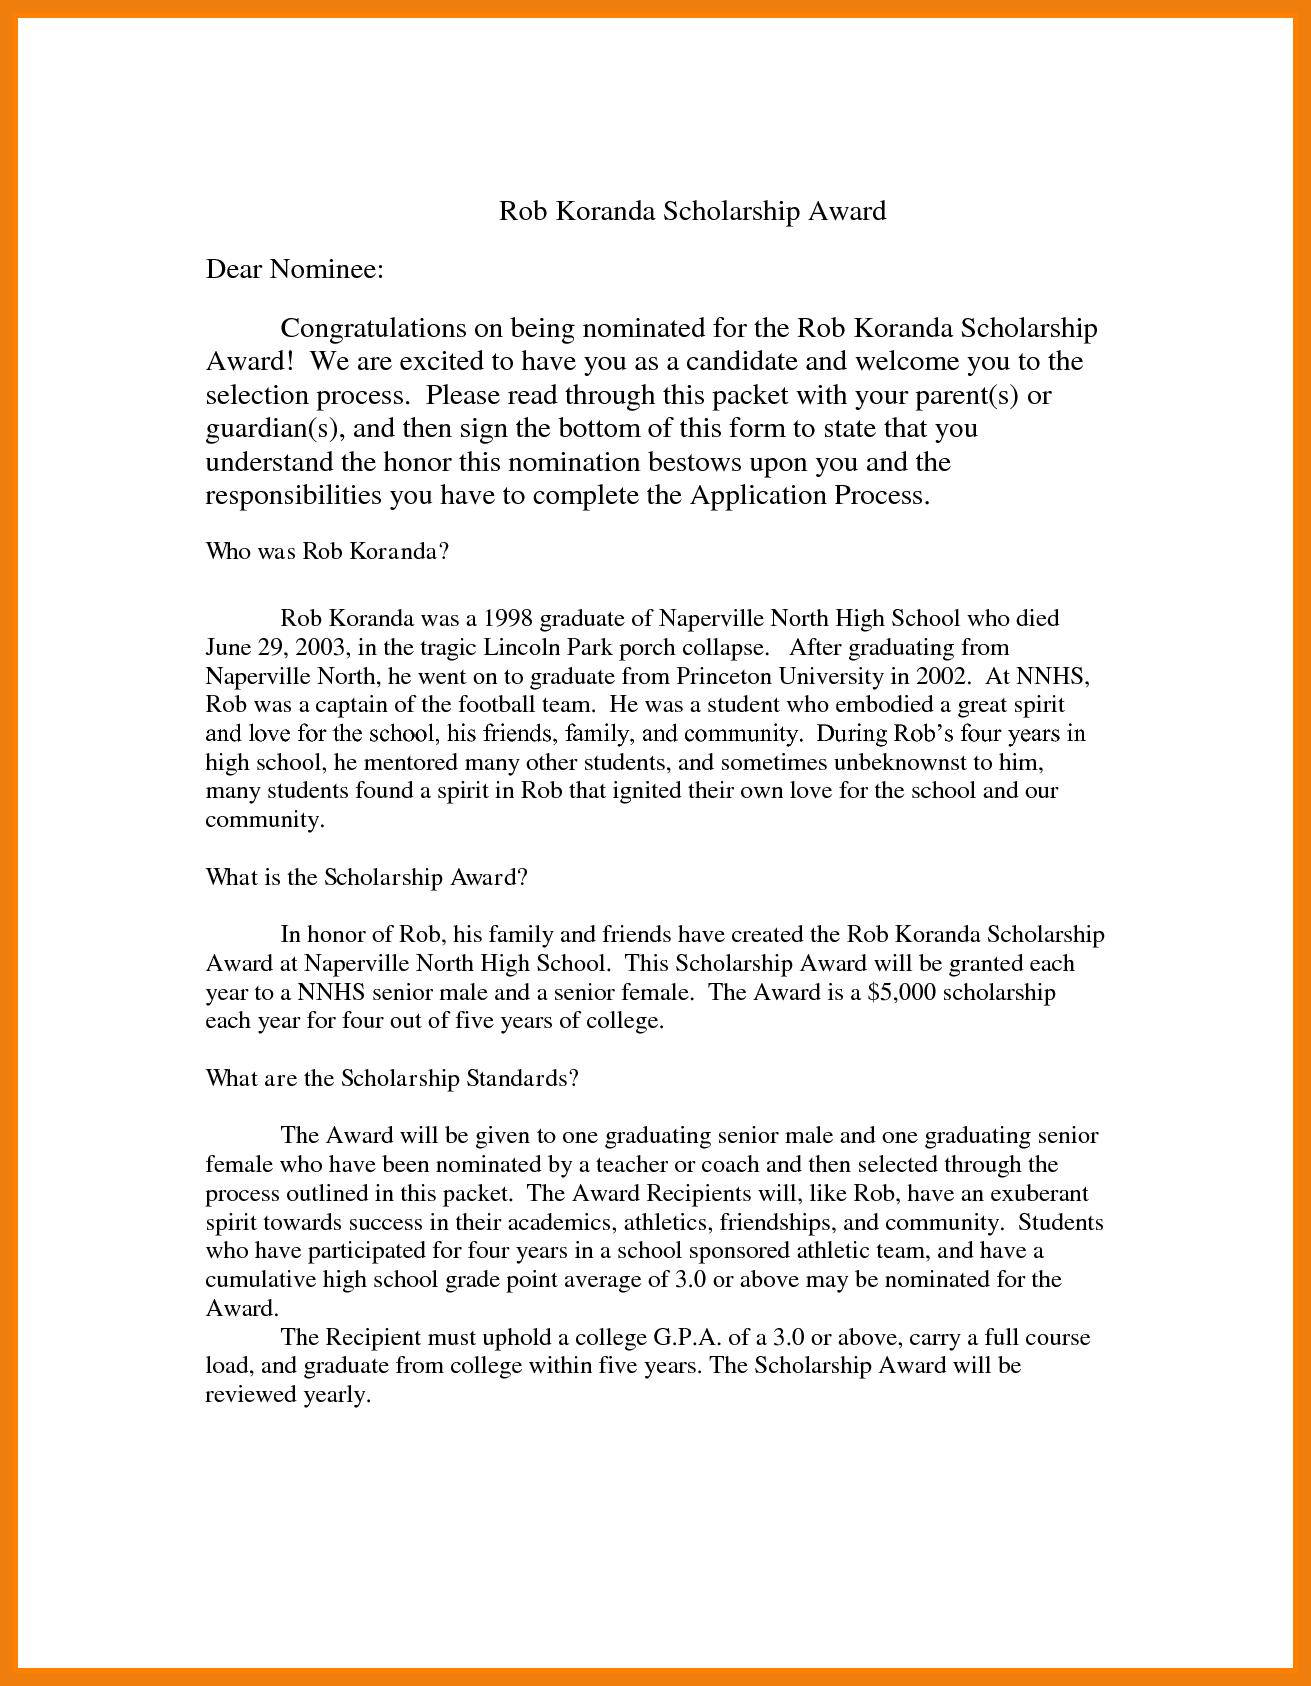 Grad School Letter Of Recommendation Template - Inspirational Letter Re Mendation Template for Graduate School